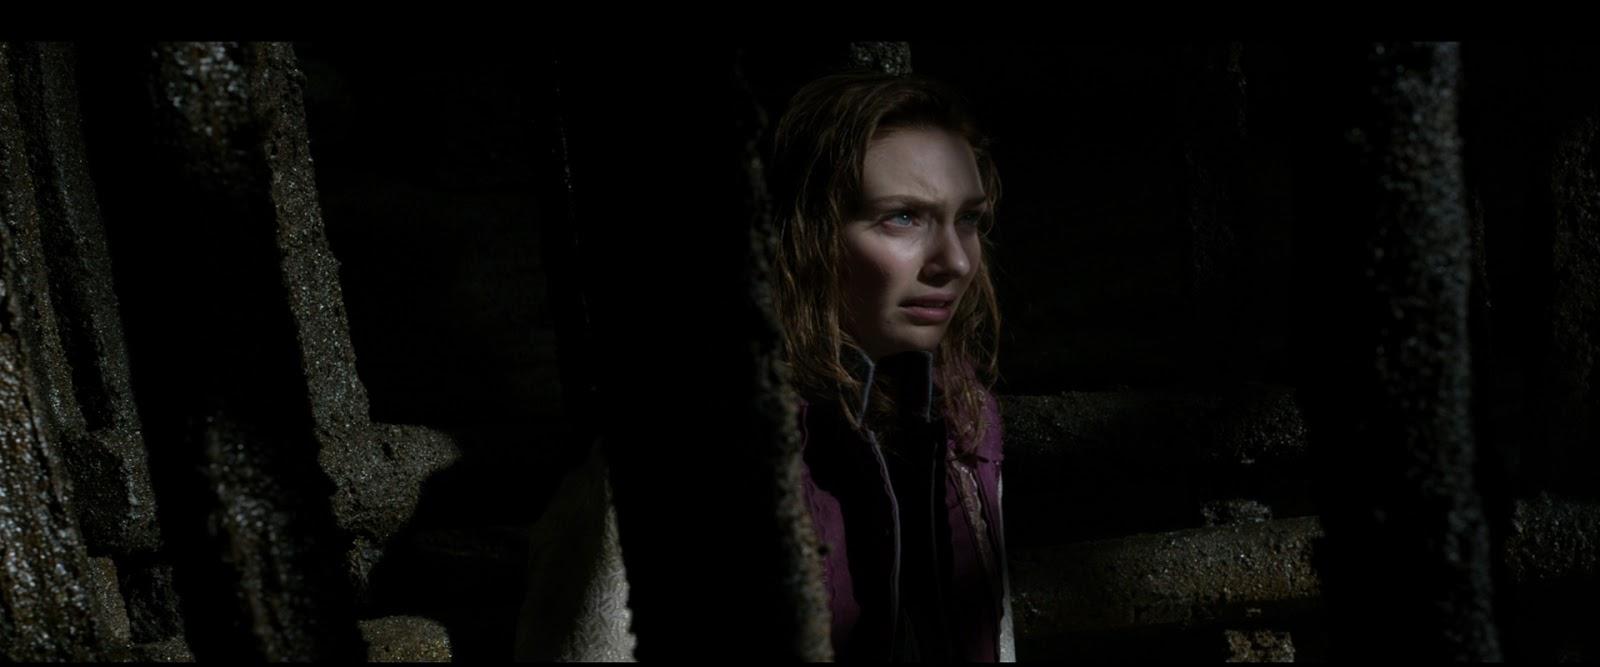 Jack the Giant Slayer (2013) 2